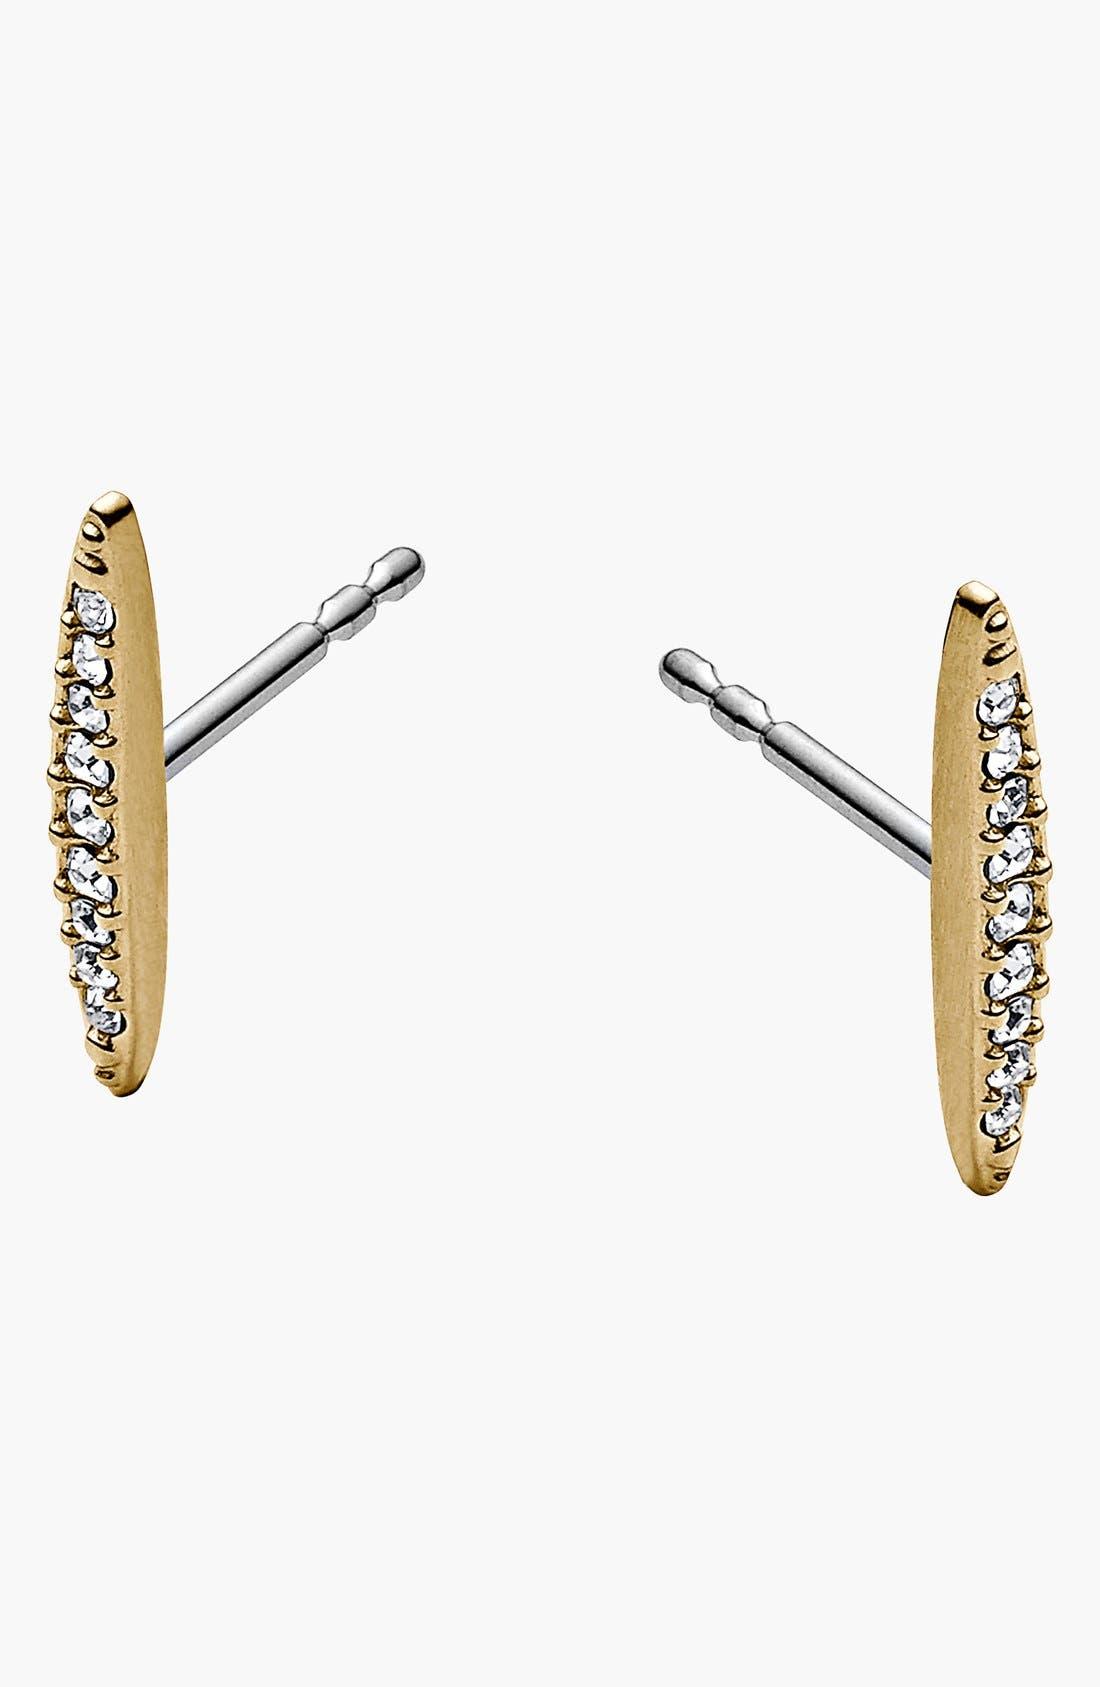 Alternate Image 1 Selected - Michael Kors 'Matchstick' Pavé Stud Earrings